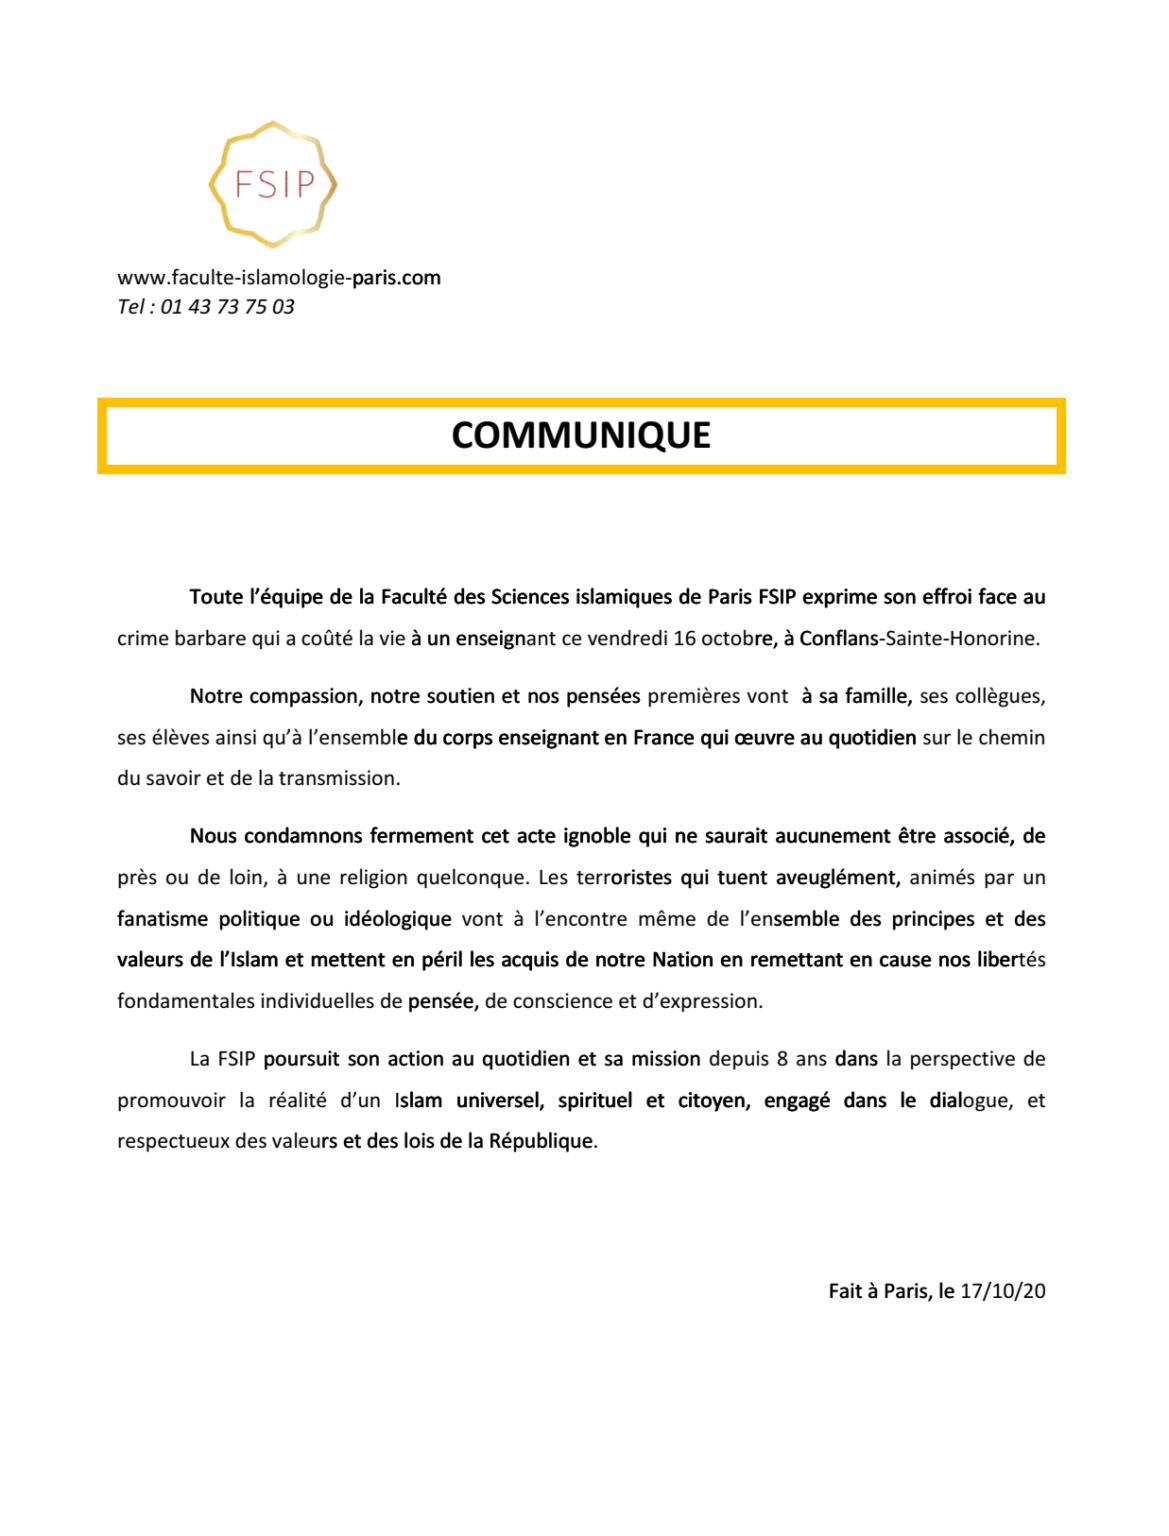 communiqué presse samuel paty condamnation FSIP